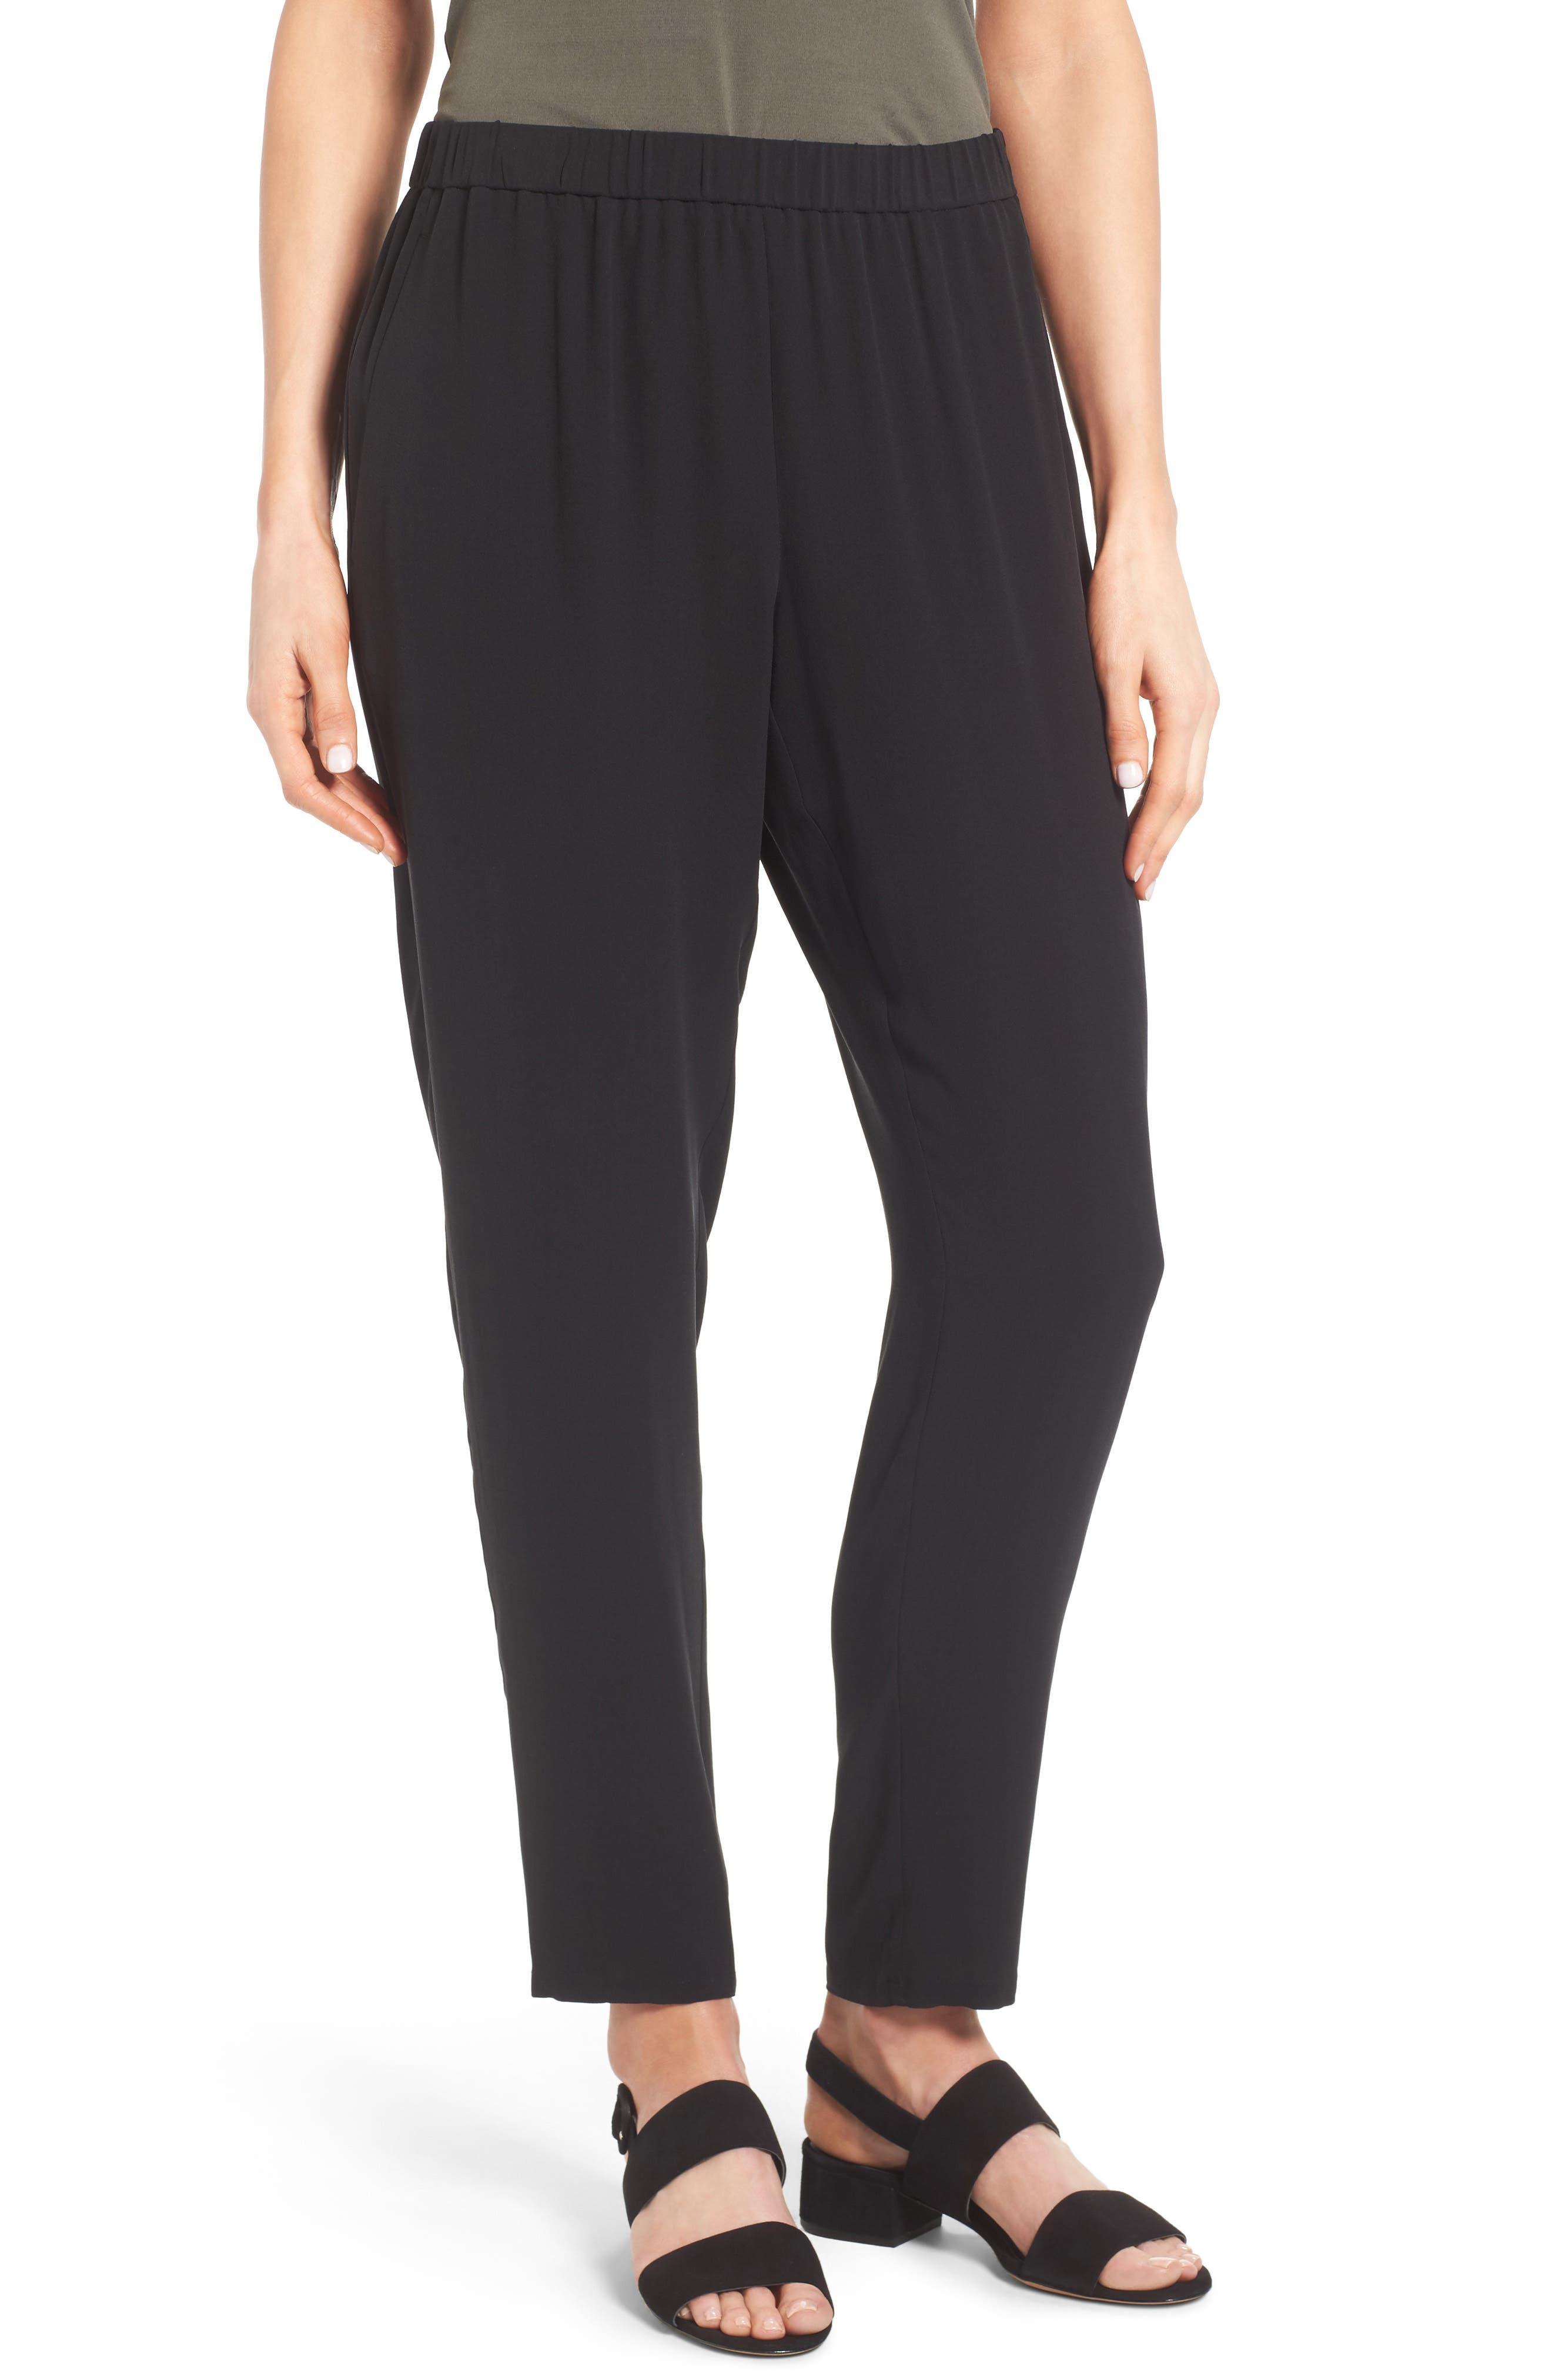 Alternate Image 1 Selected - Eileen Fisher Slouchy Silk Crepe Ankle Pants (Regular & Petite)